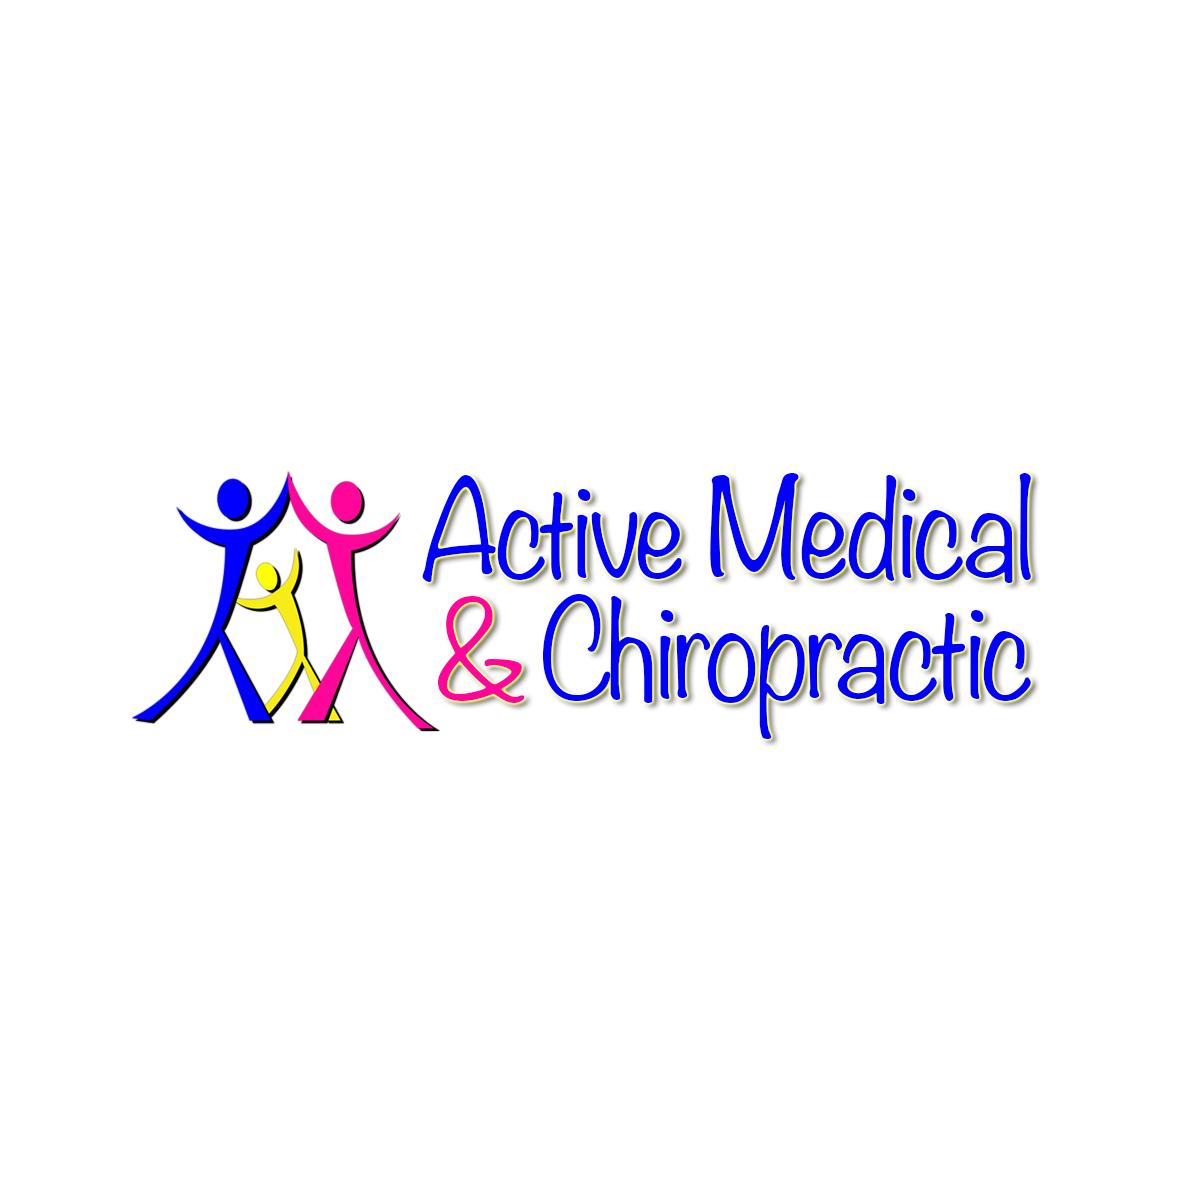 Active Medical & Chiropractic